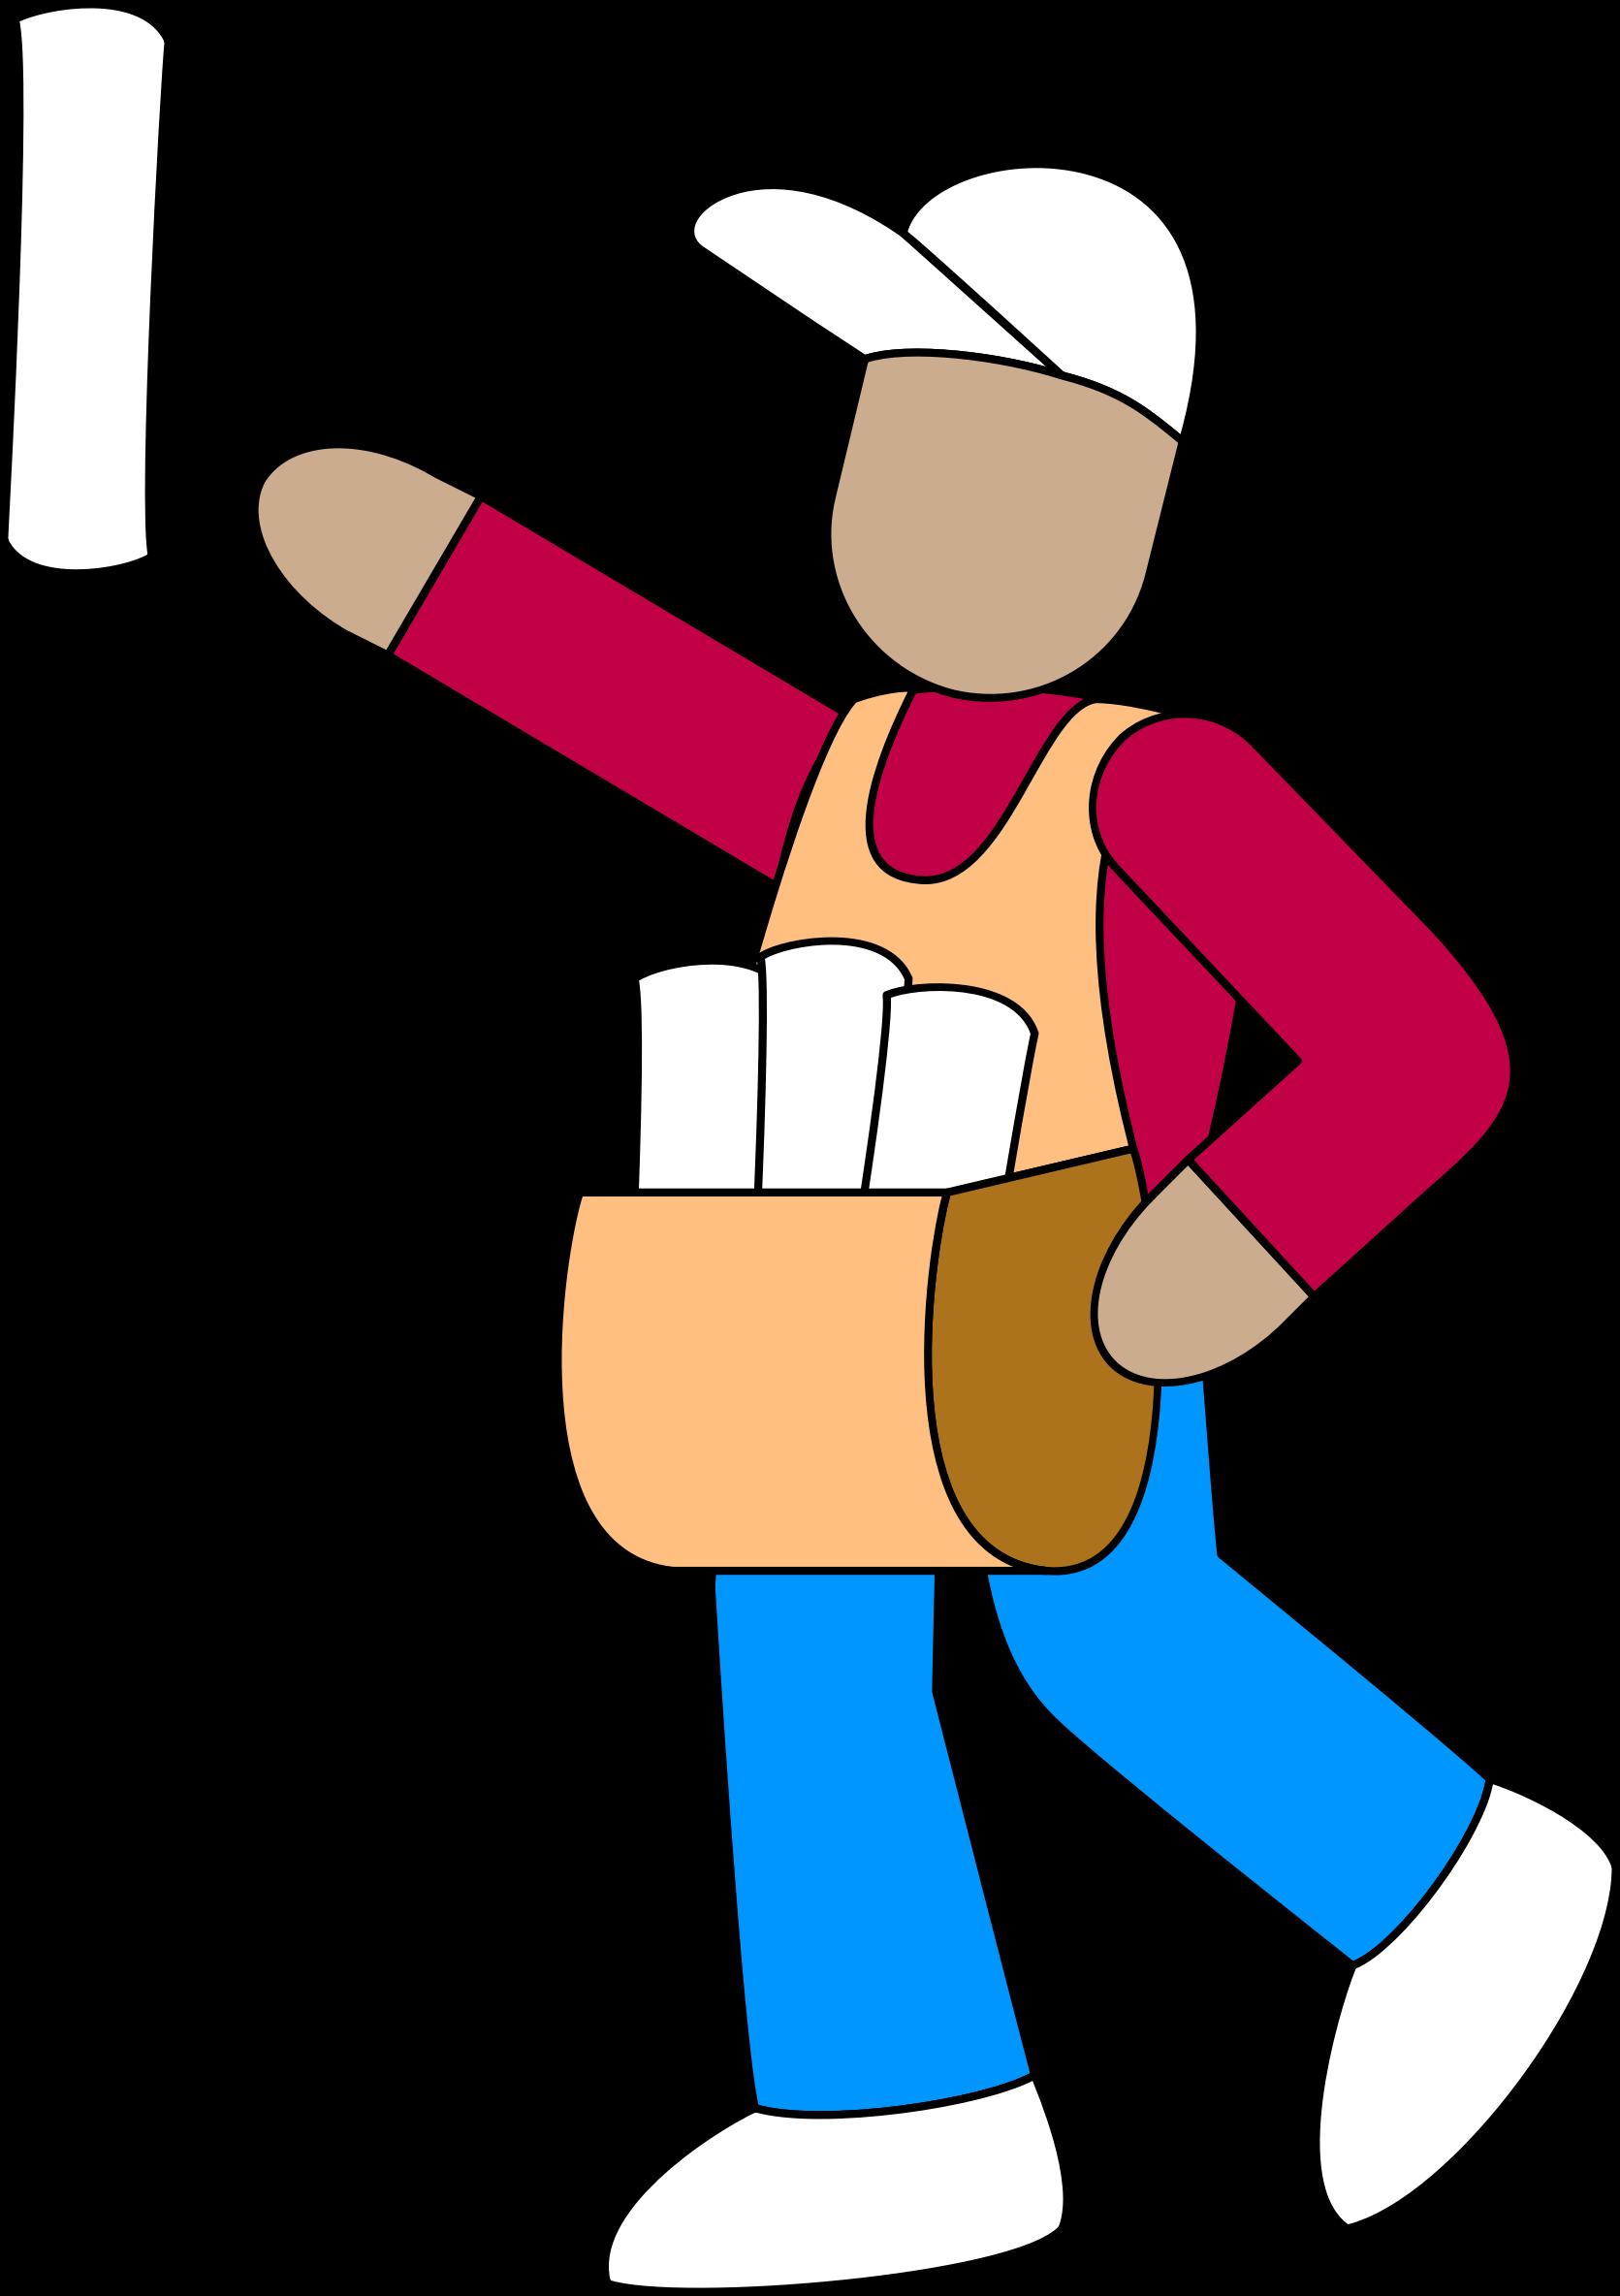 Big image png. News clipart paperboy